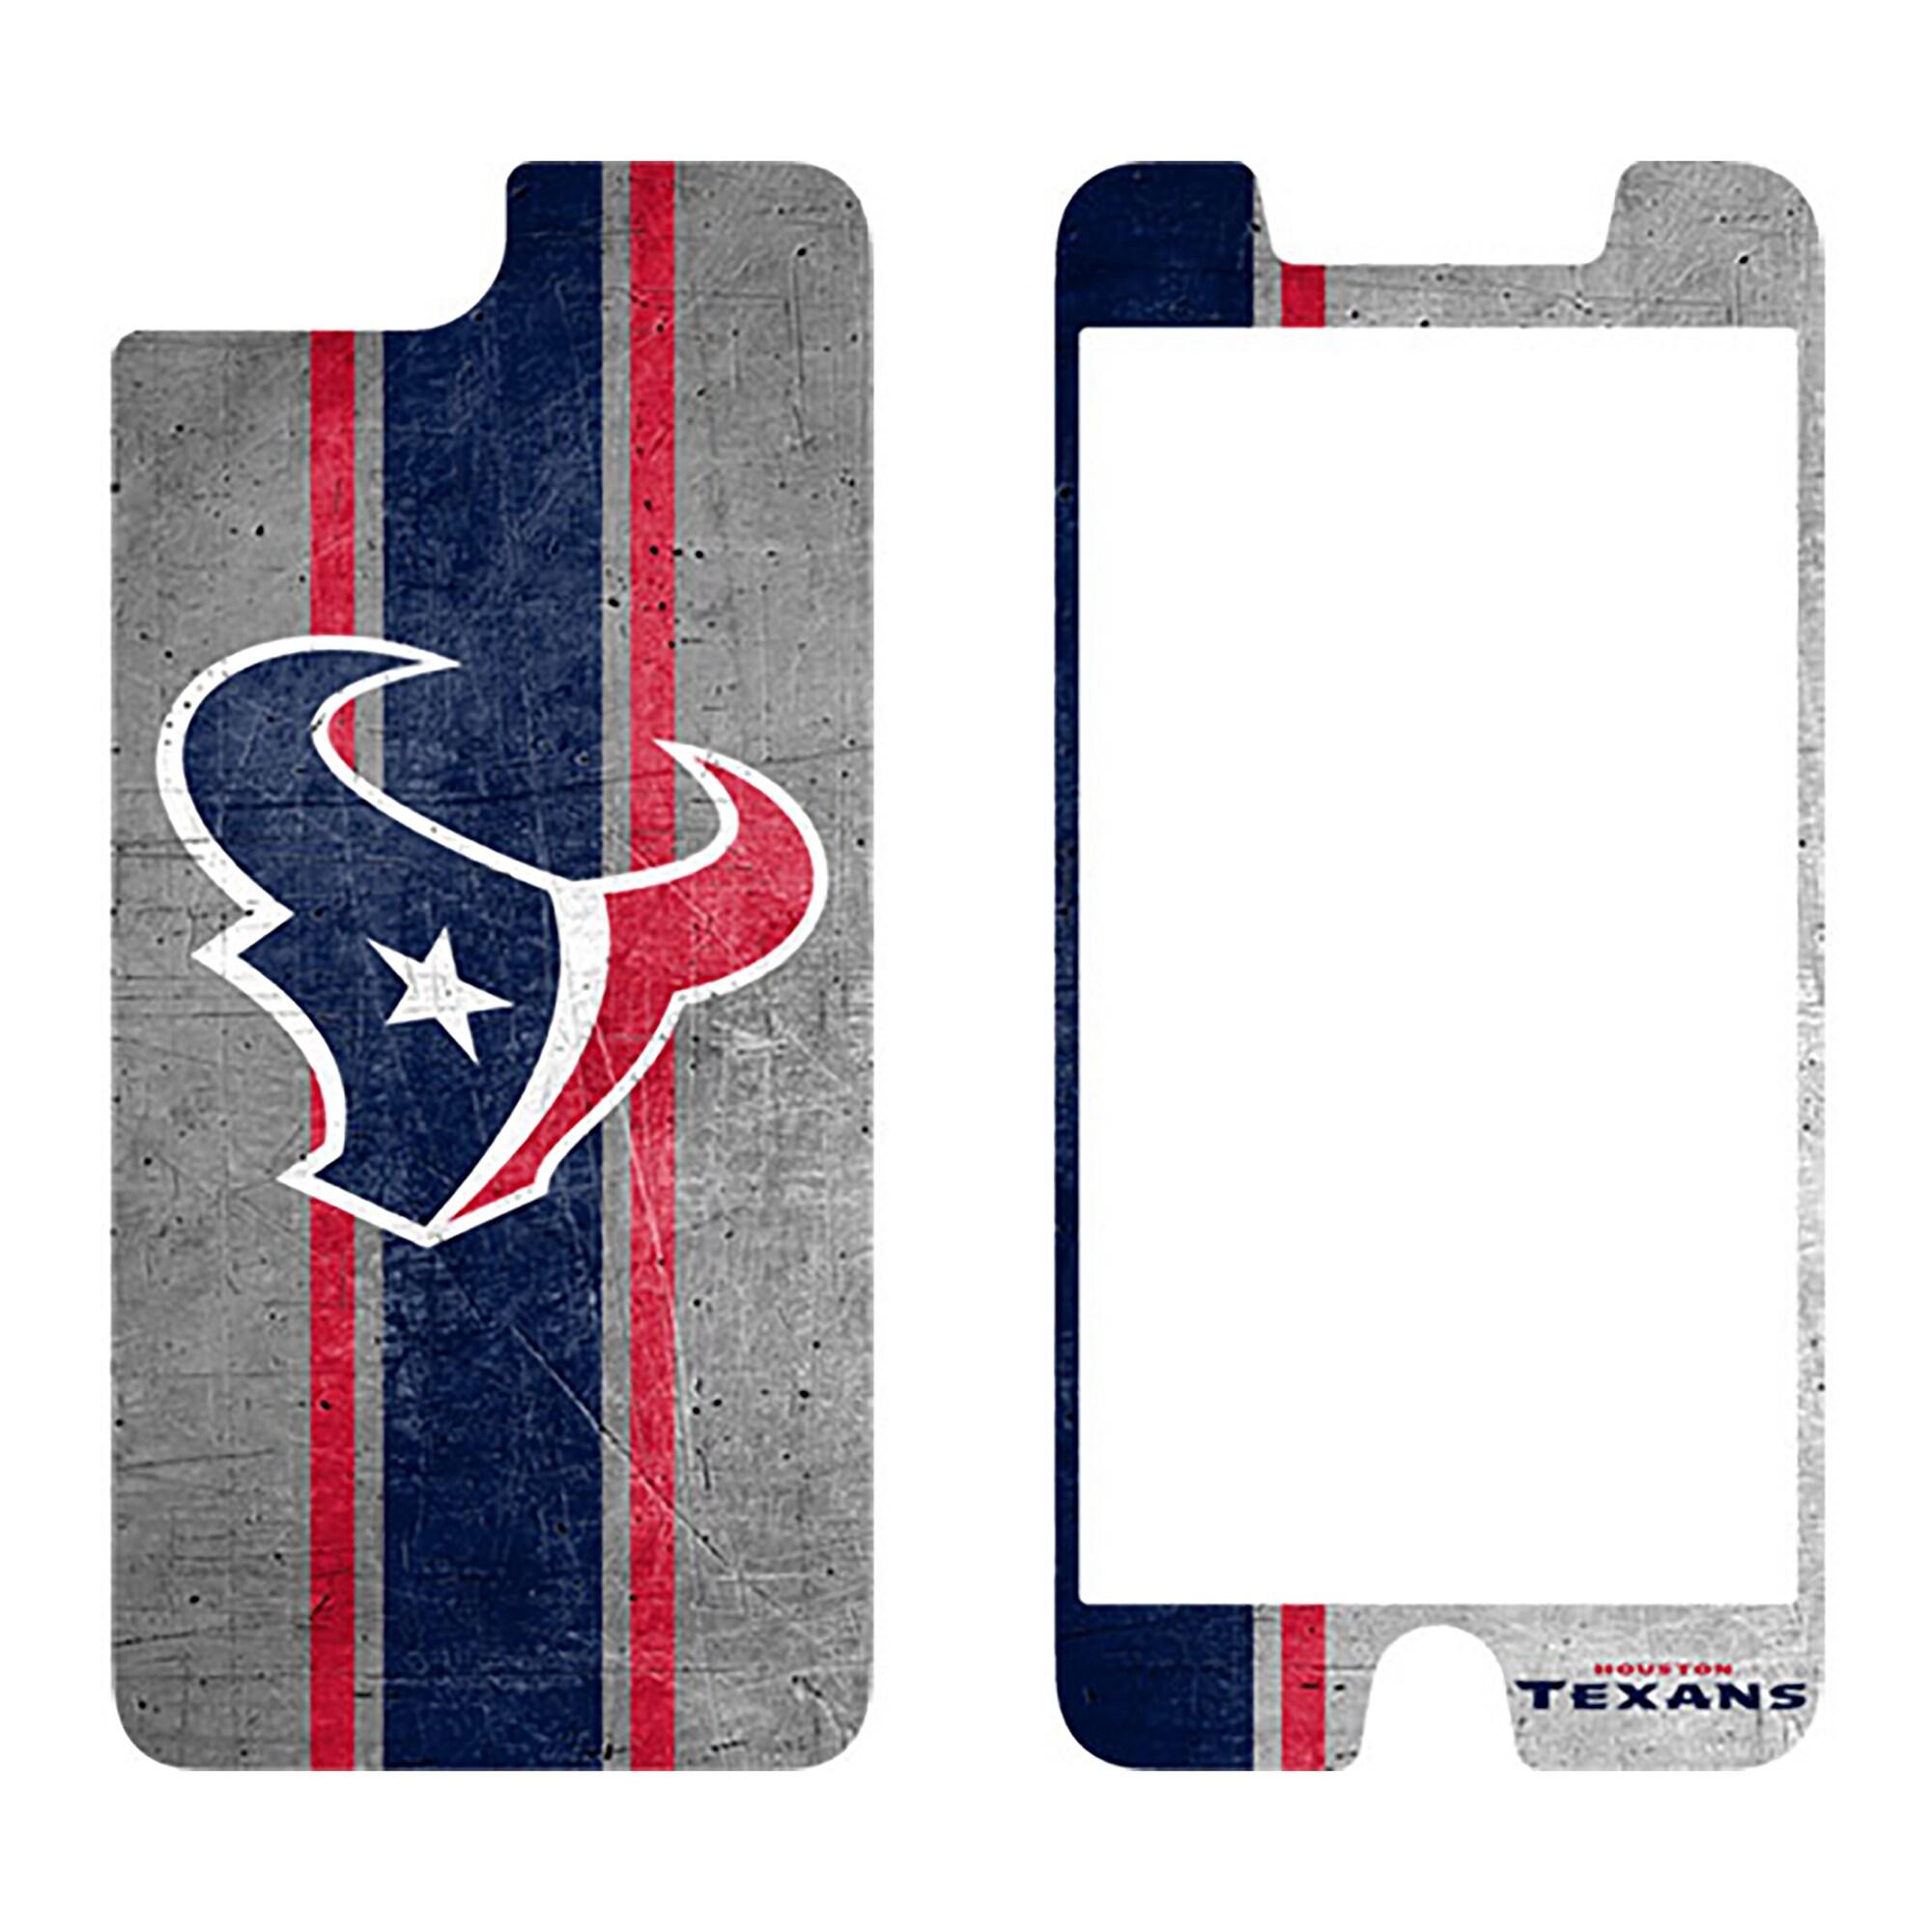 Houston Texans OtterBox iPhone 8 Plus/7 Plus/6 Plus/6s Plus Alpha Glass Screen Protector